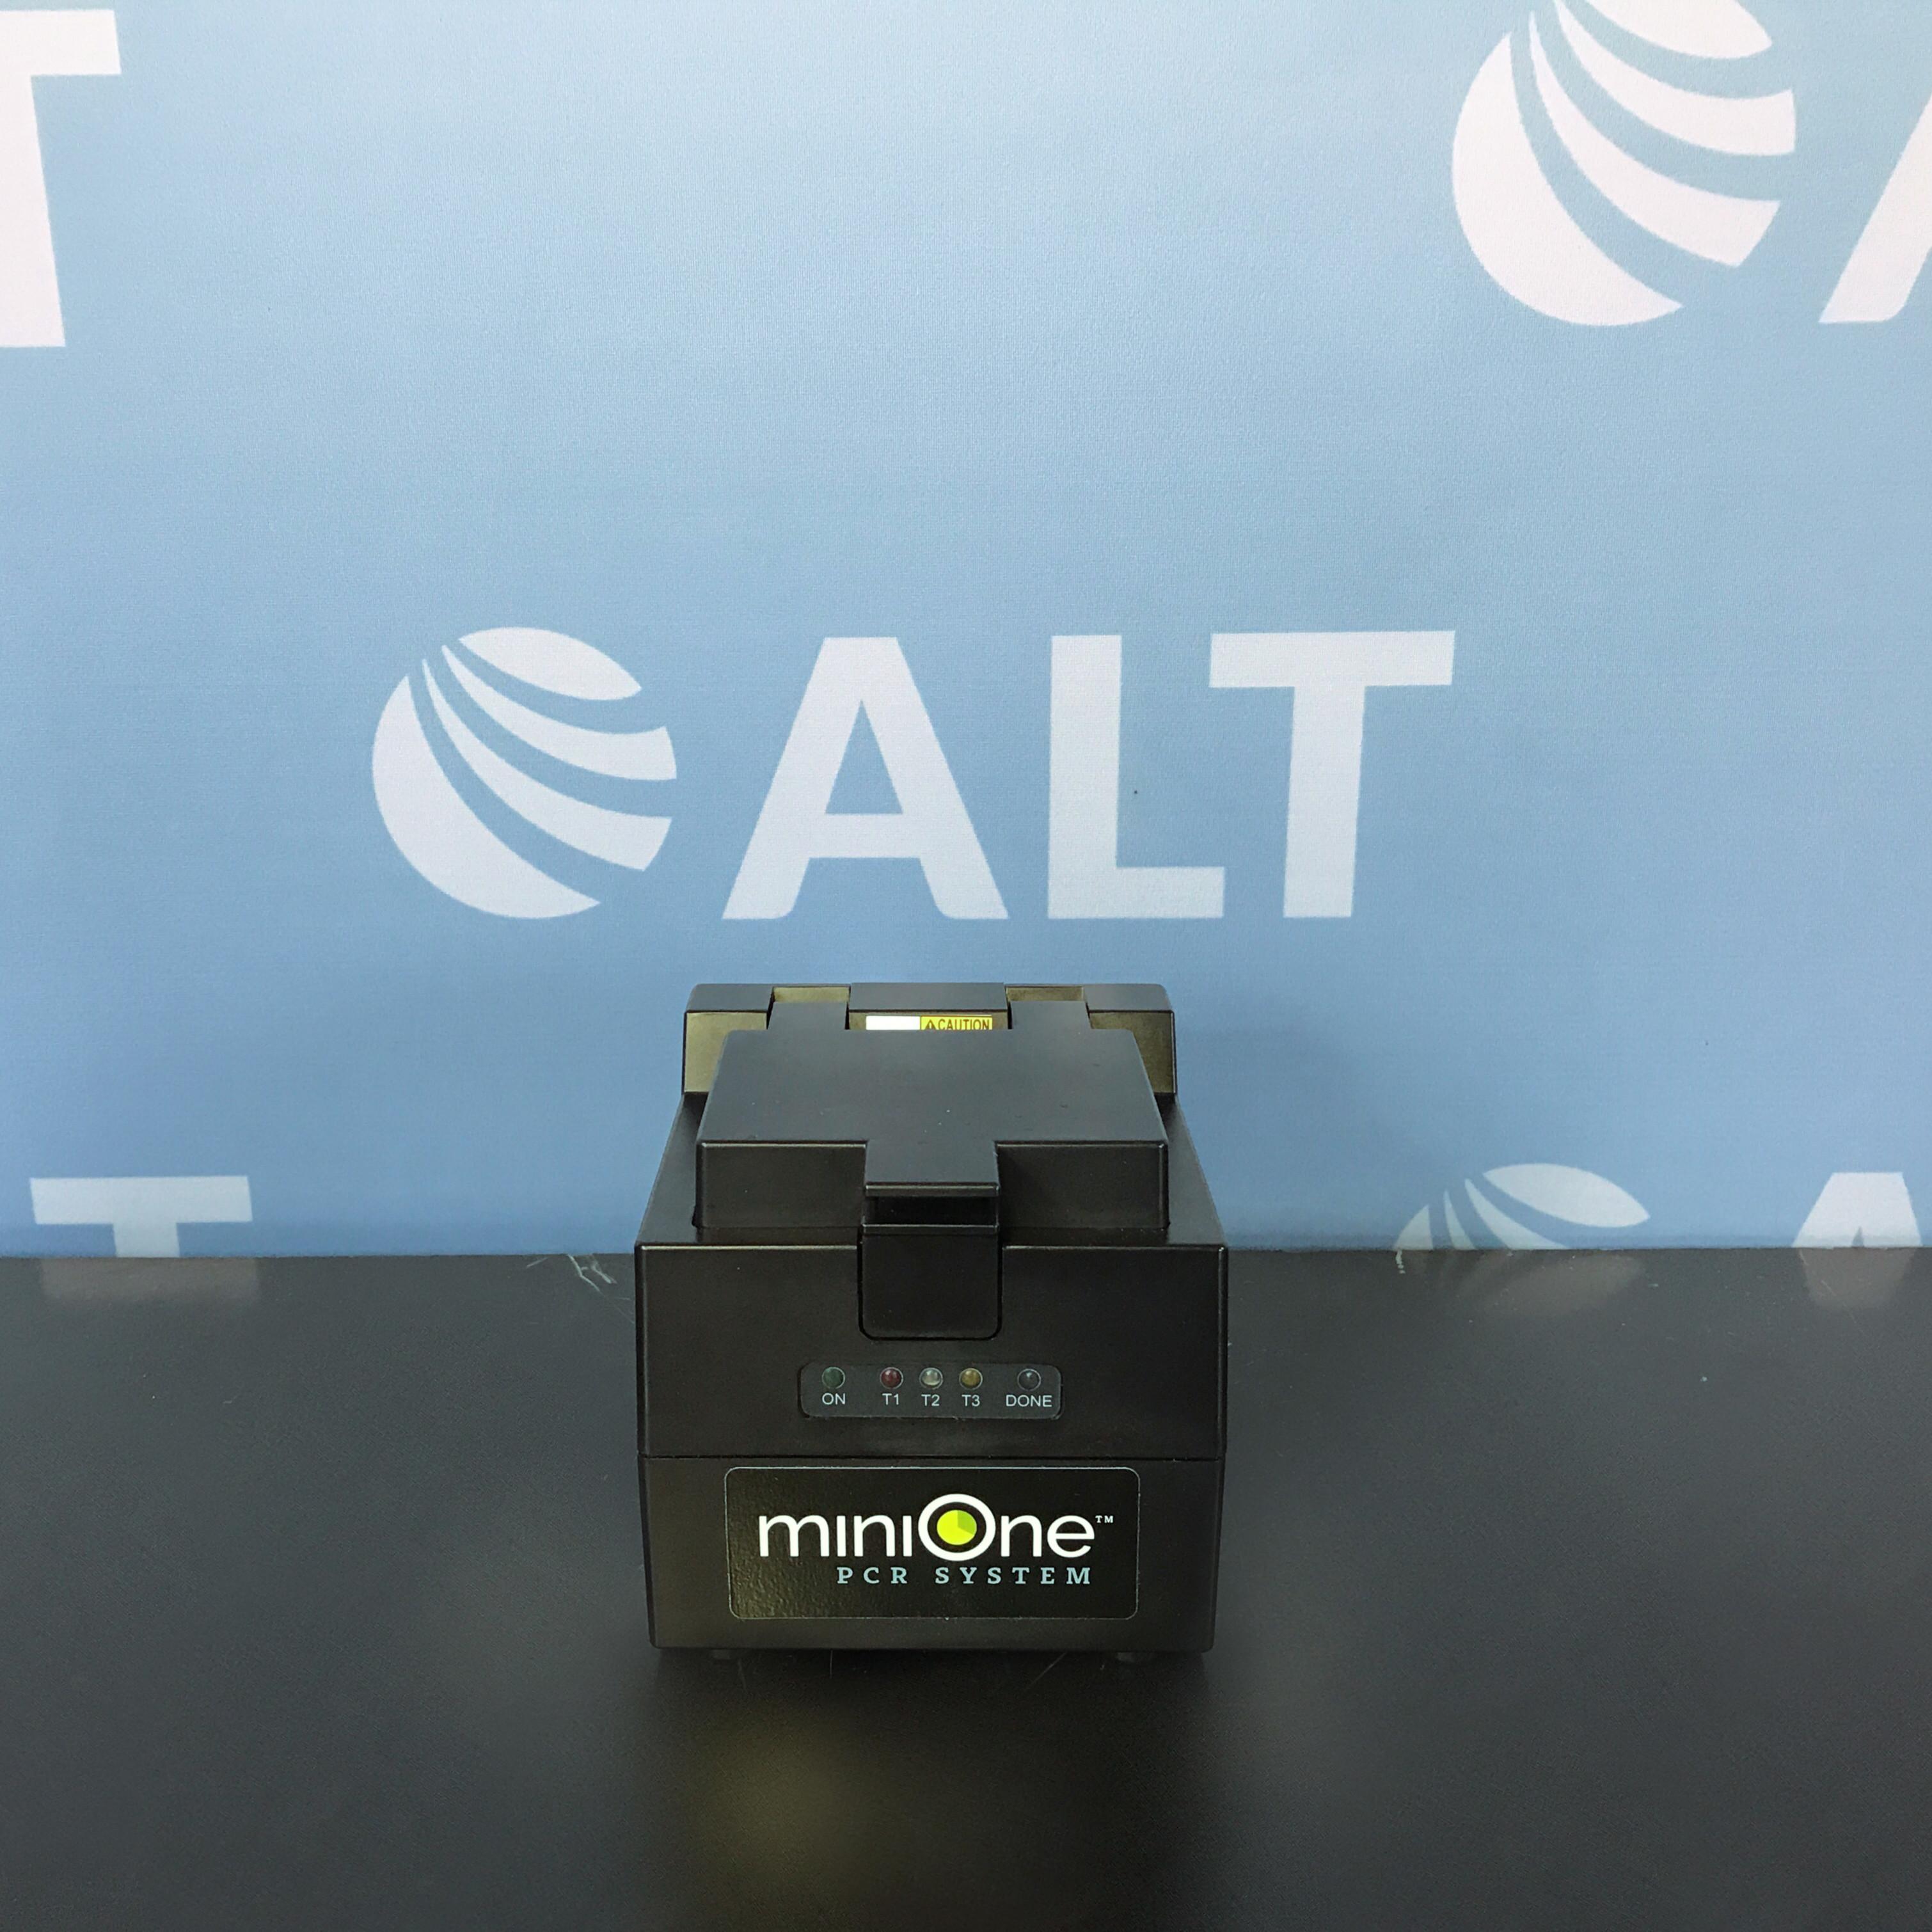 The MiniOne M4000 PCR System Name